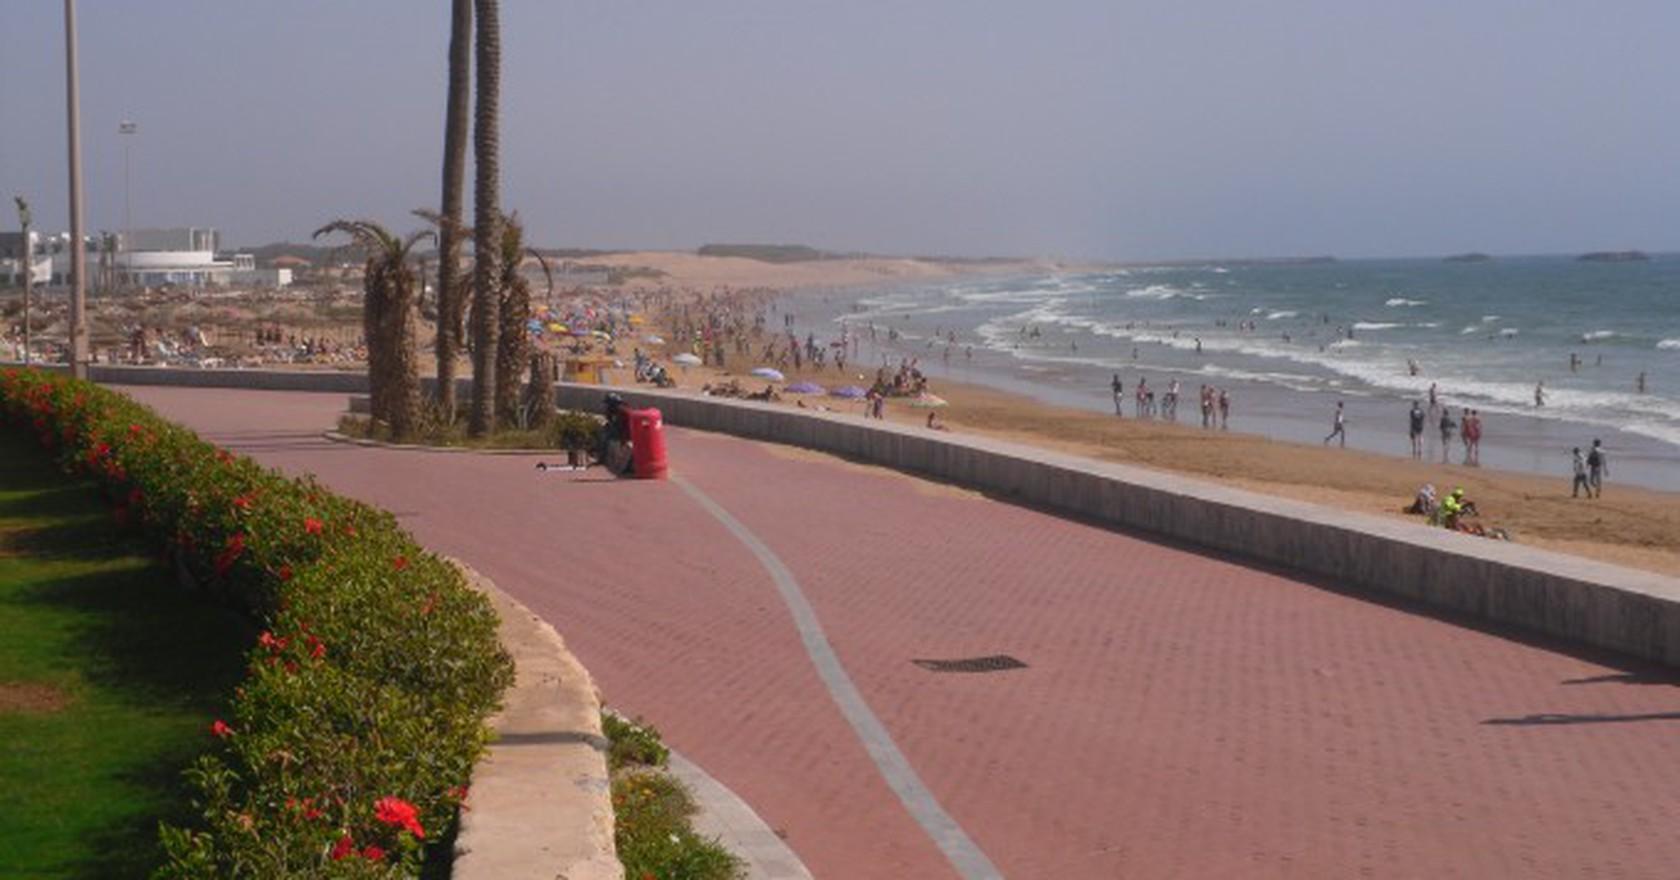 01 Beach Agadir Morocco Elmschrat Wikicommons